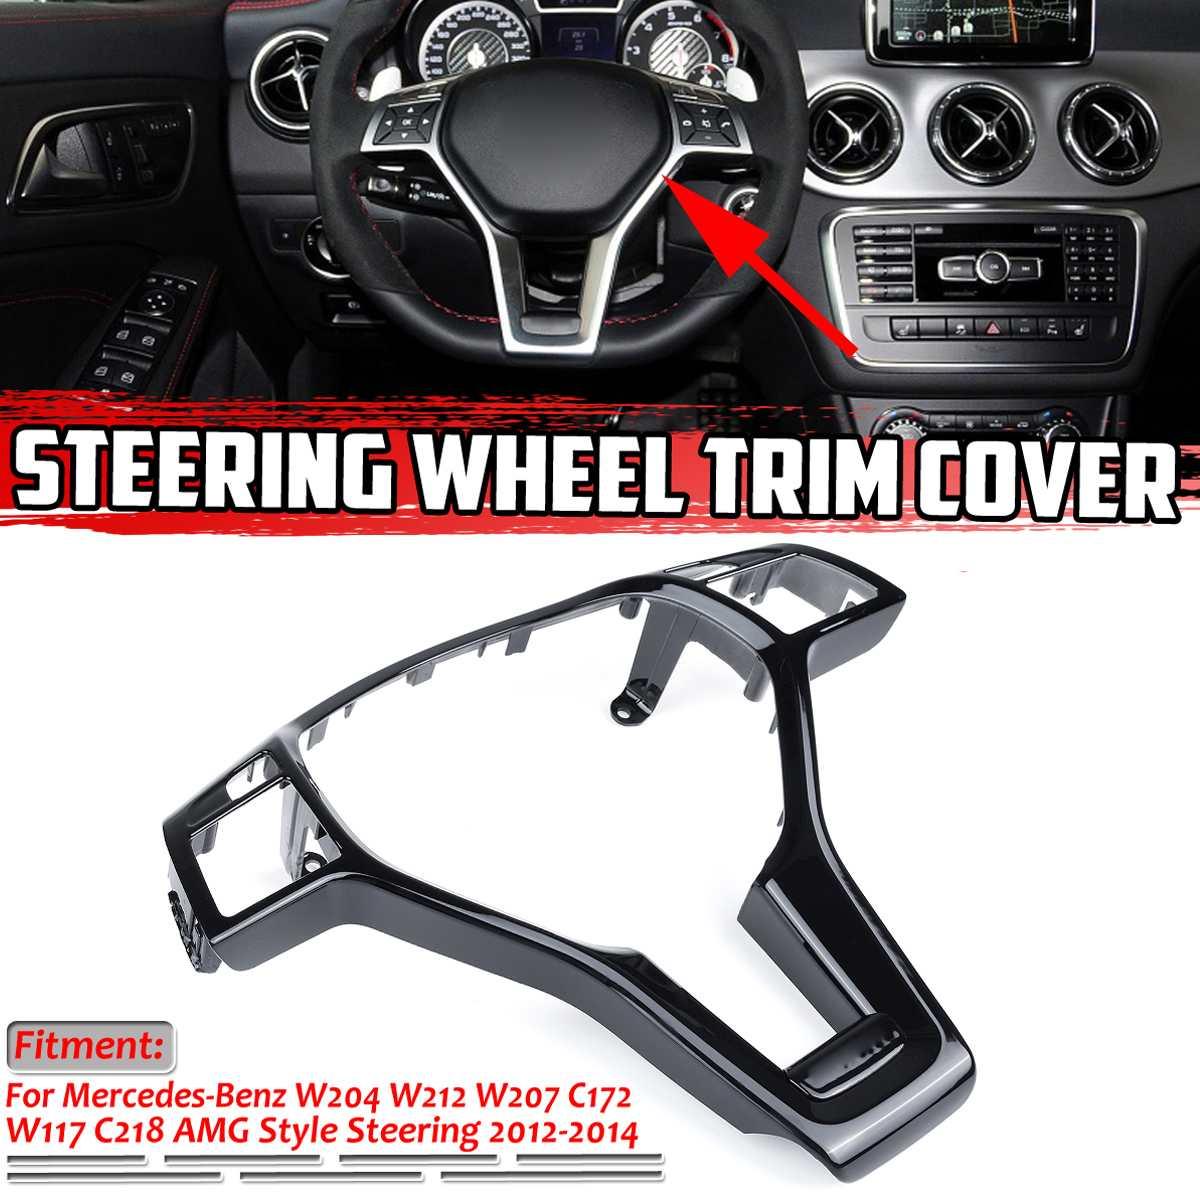 Отделка рамы рулевого колеса W204 для Mercedes Benz C E CLA CLASS W204 W212 W117 C172 C218 2012-2014 для AMG Style